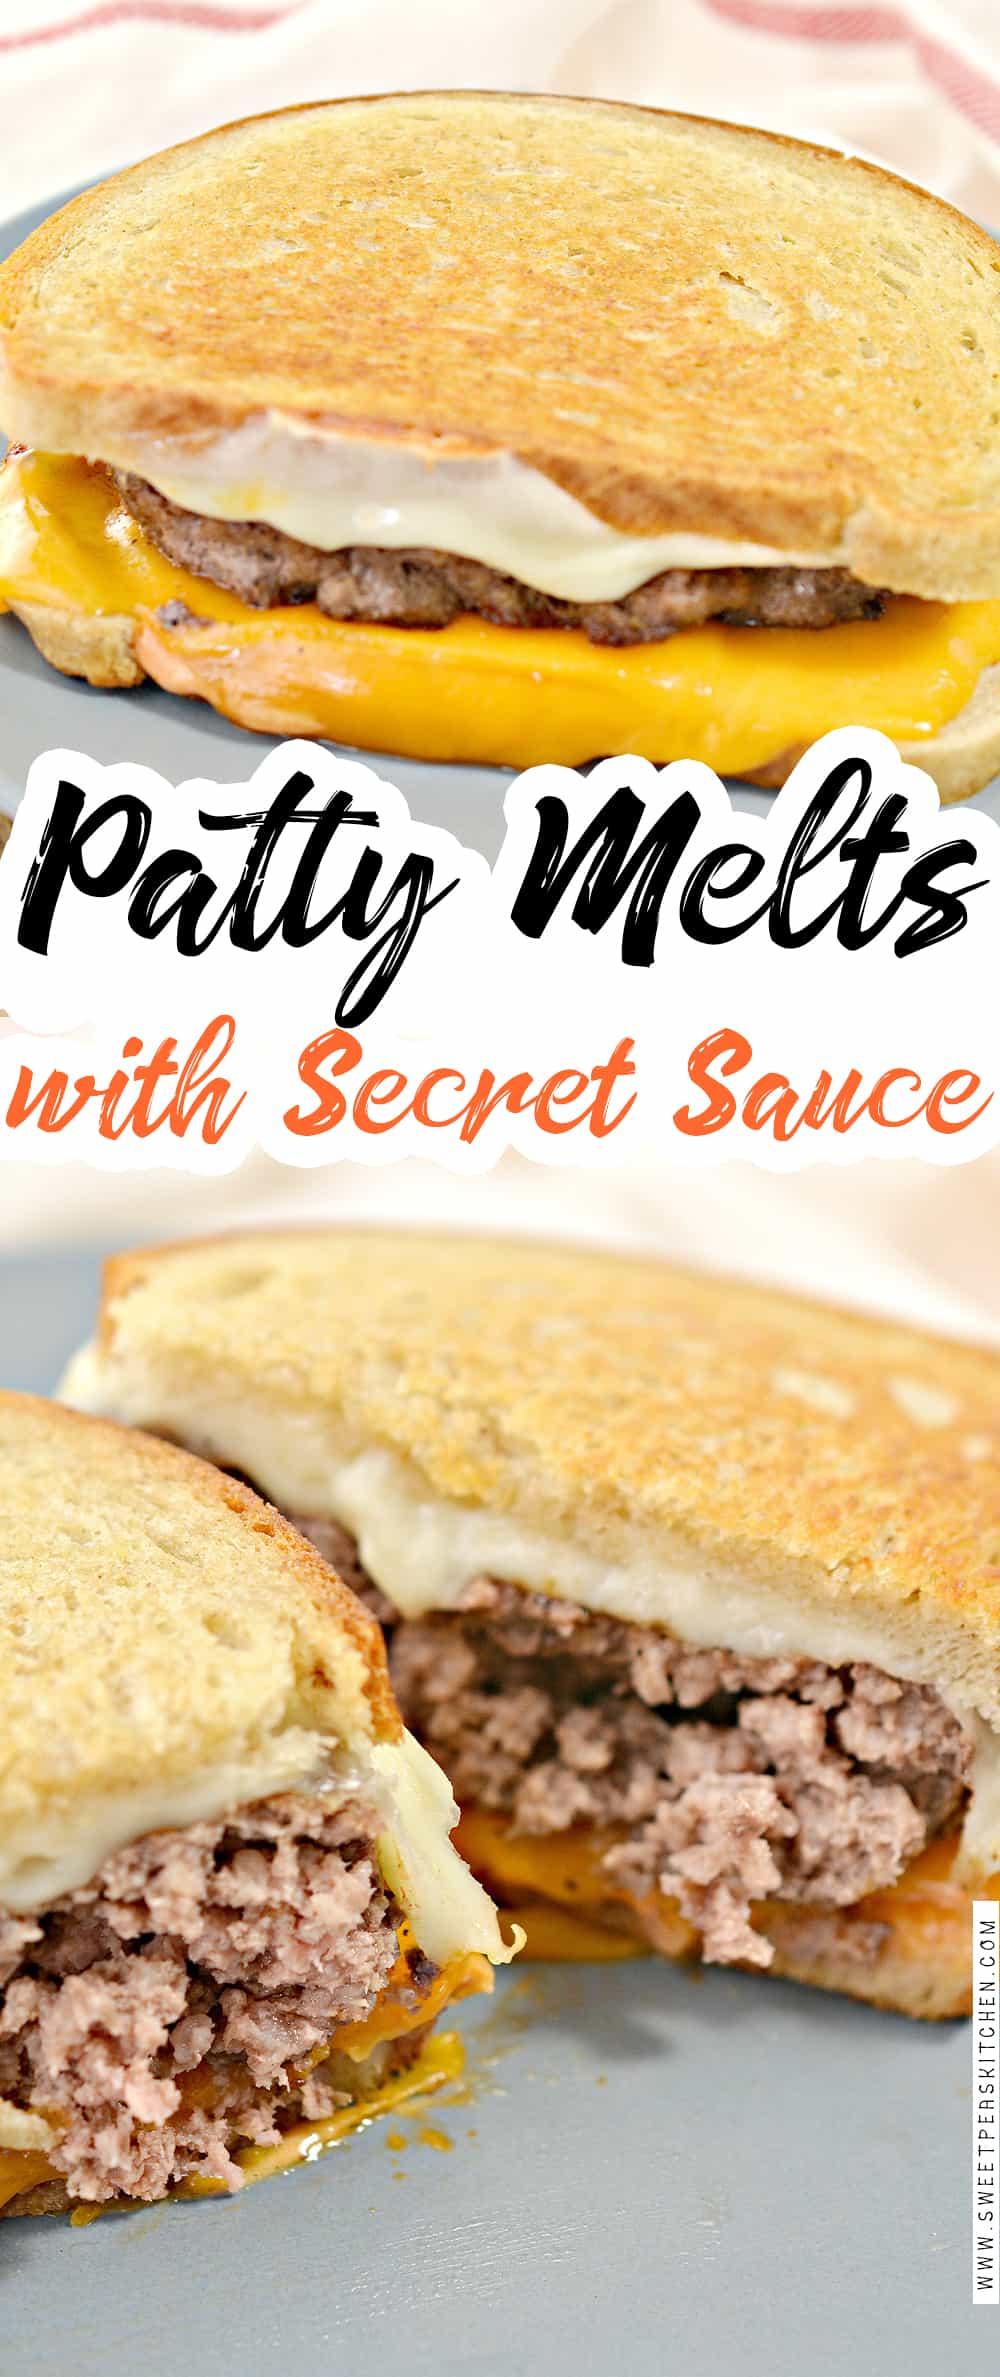 Patty Melts with Secret Sauce